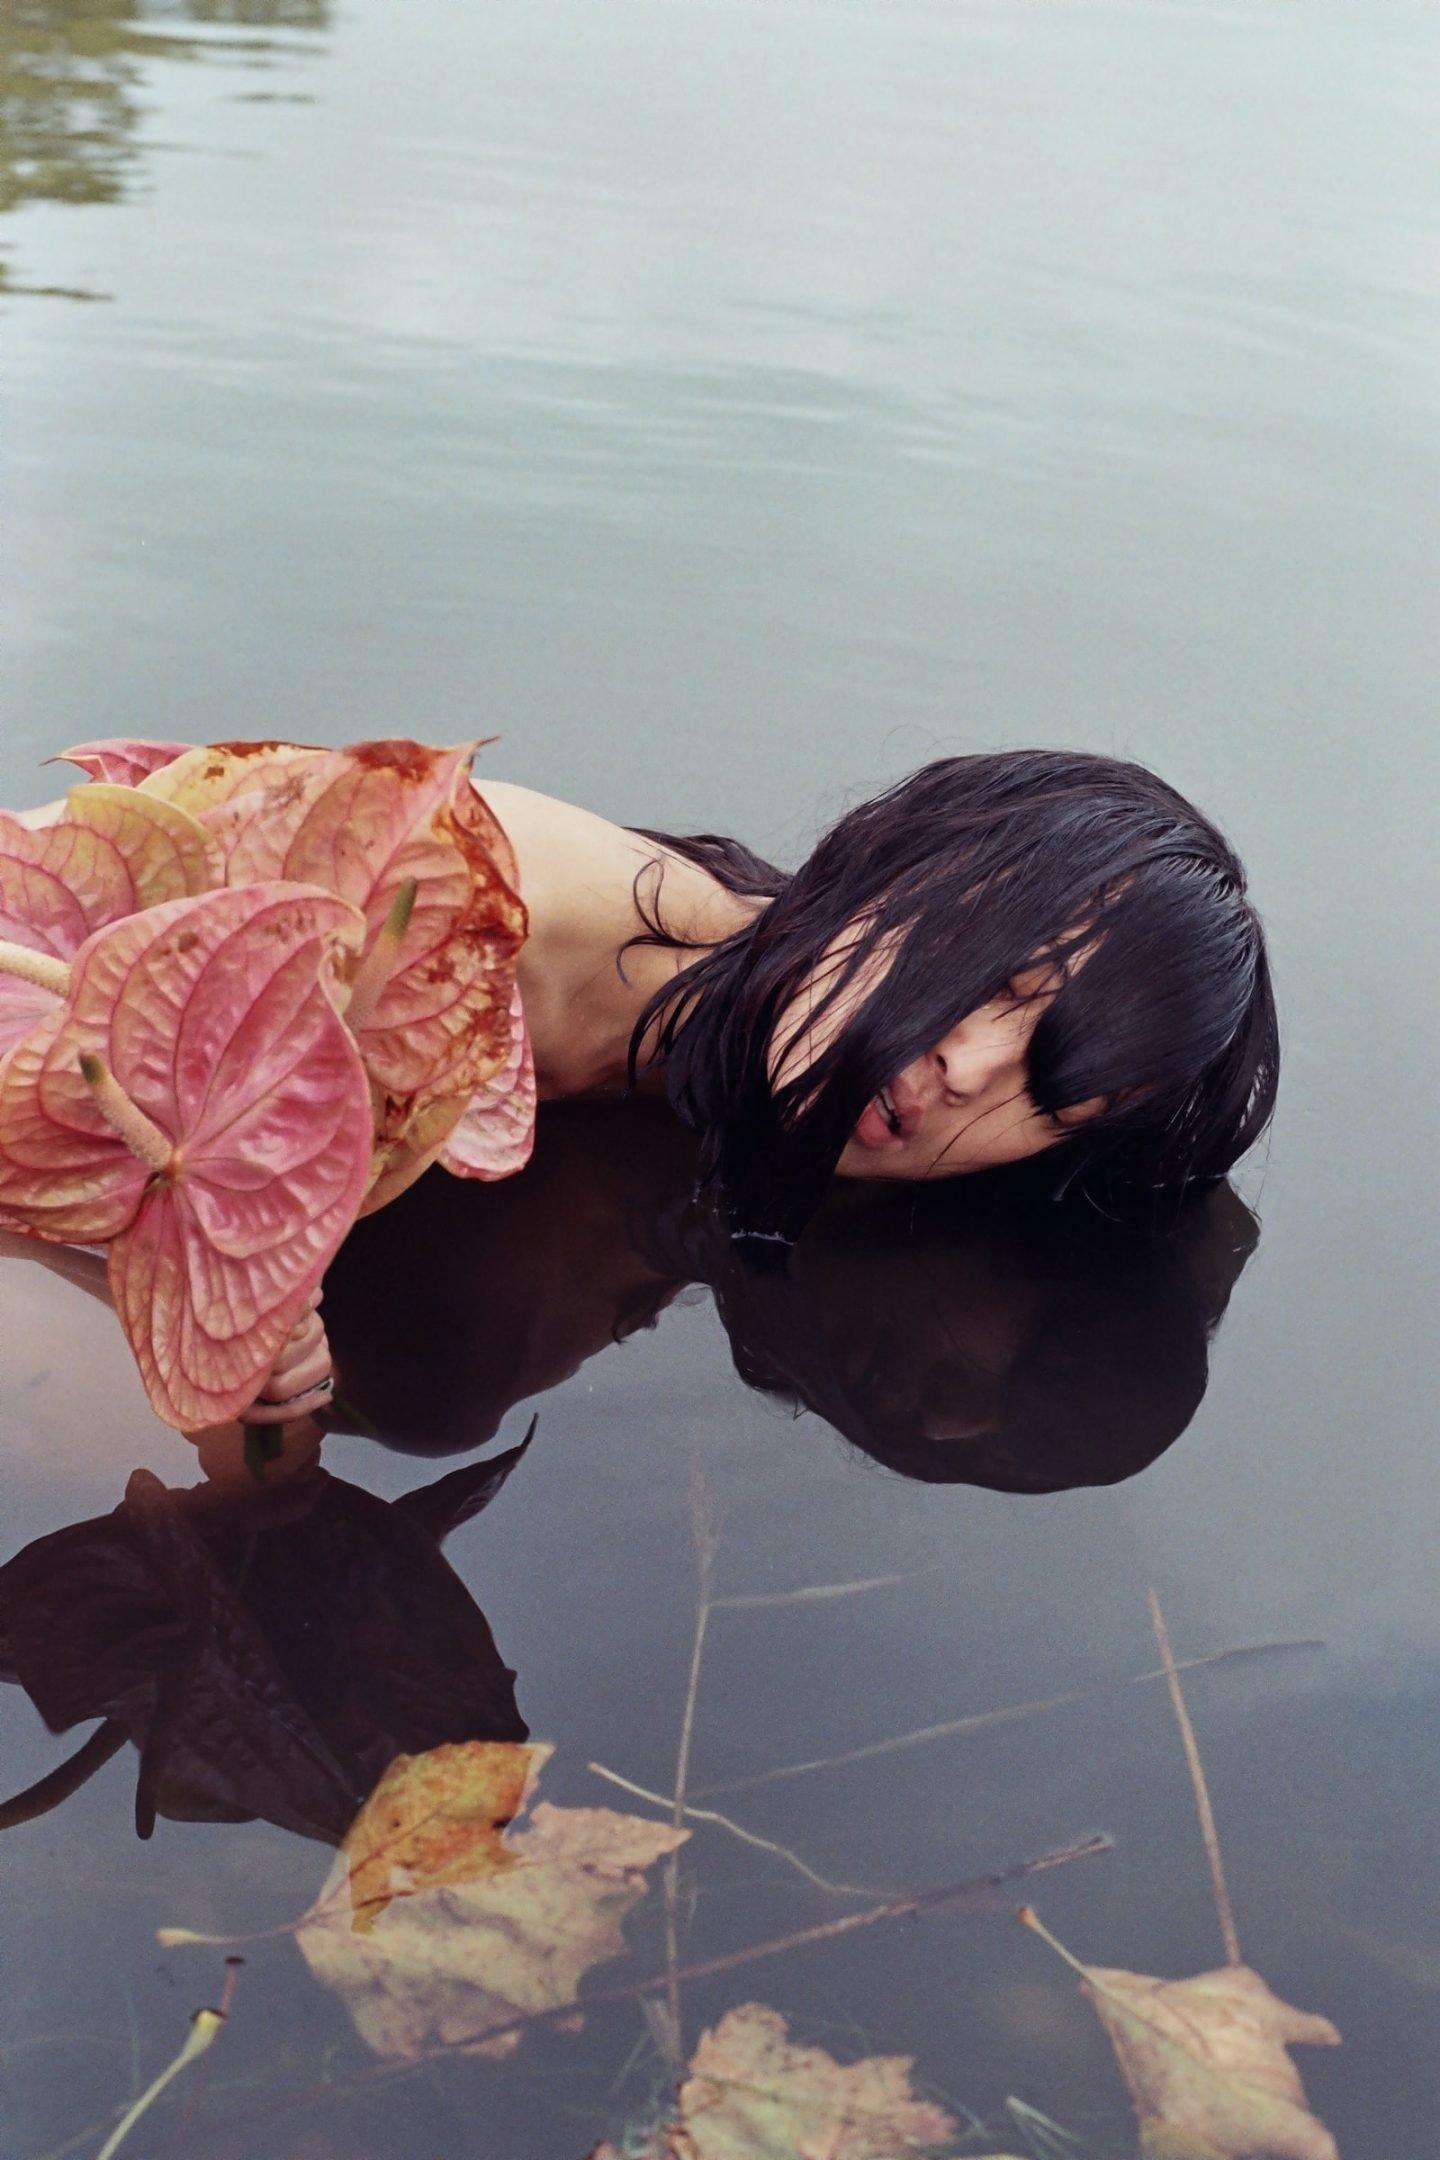 IGNANT-Photography-Denisse-Ariana-Pérez-Agua-015